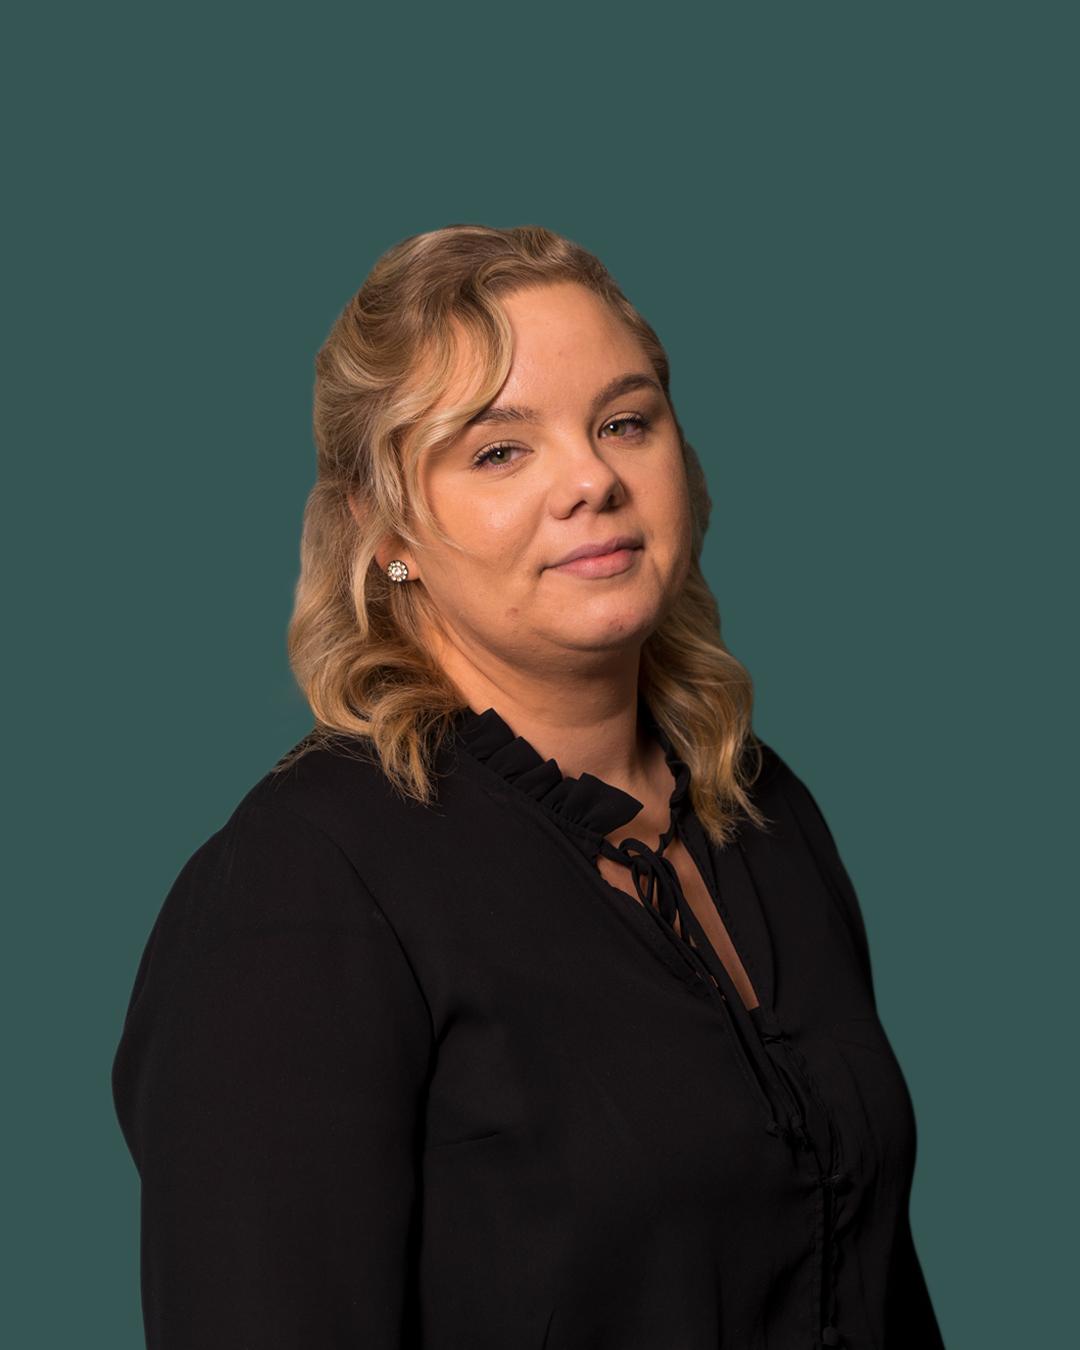 Josefine Johansson